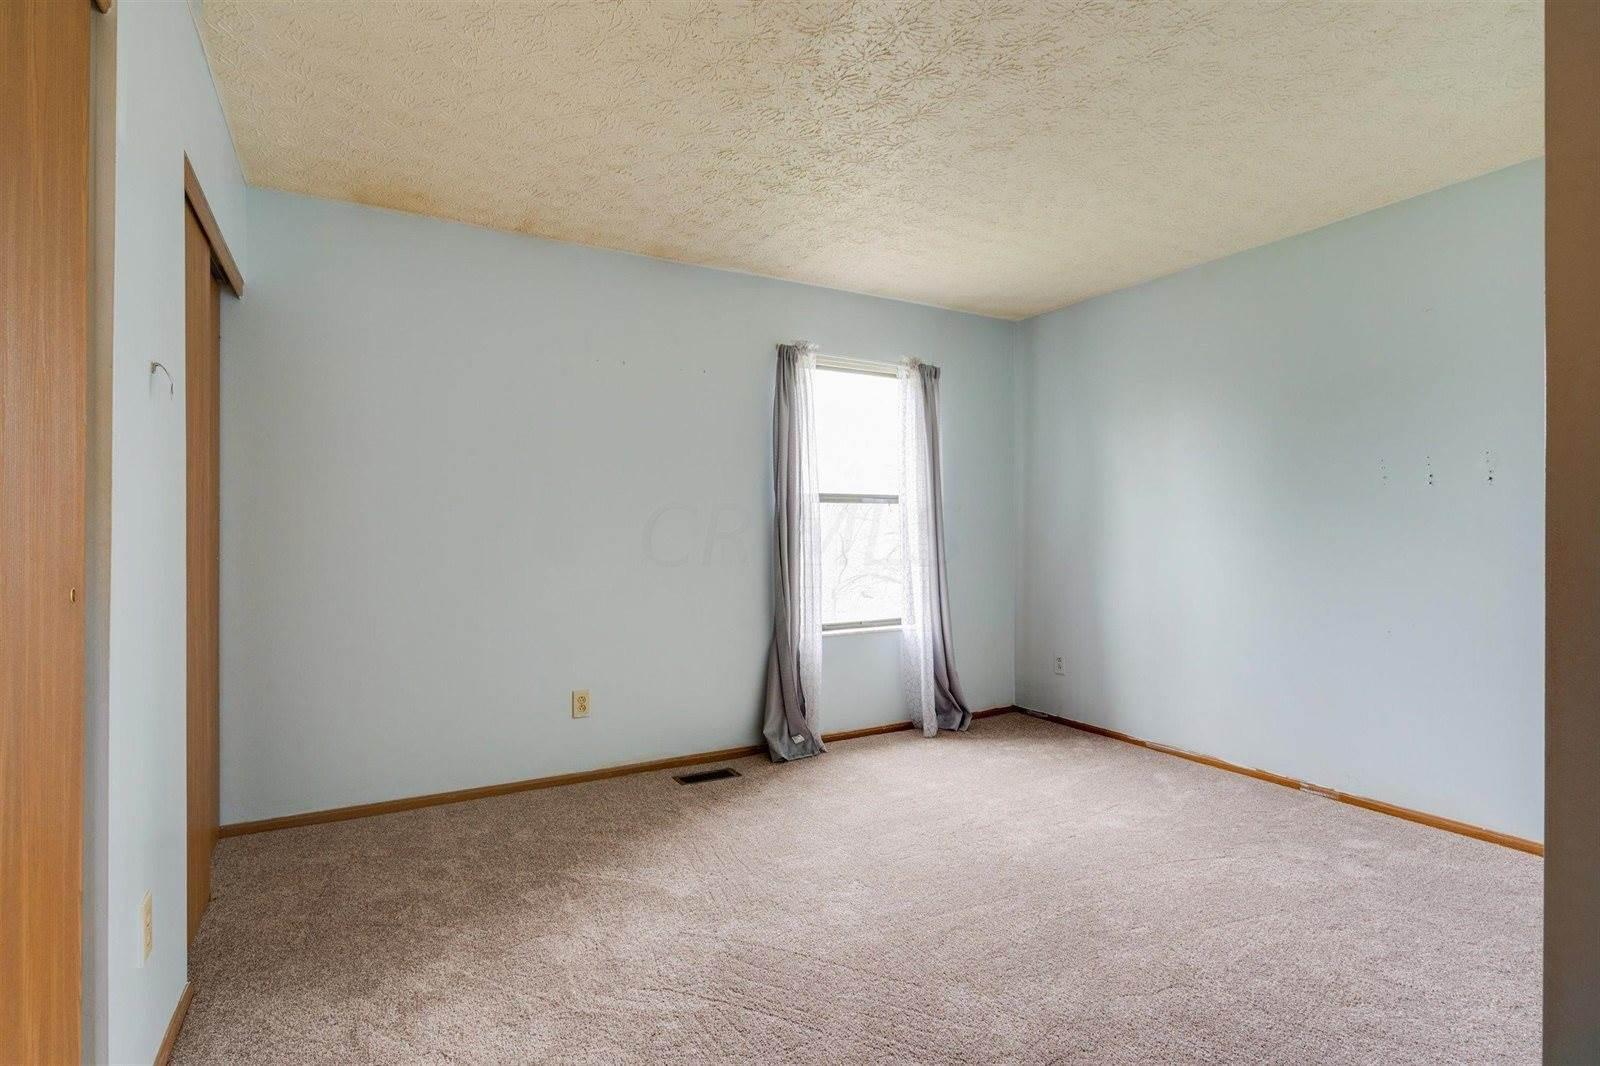 838 Soramill Lane, #46A, Worthington, OH 43085